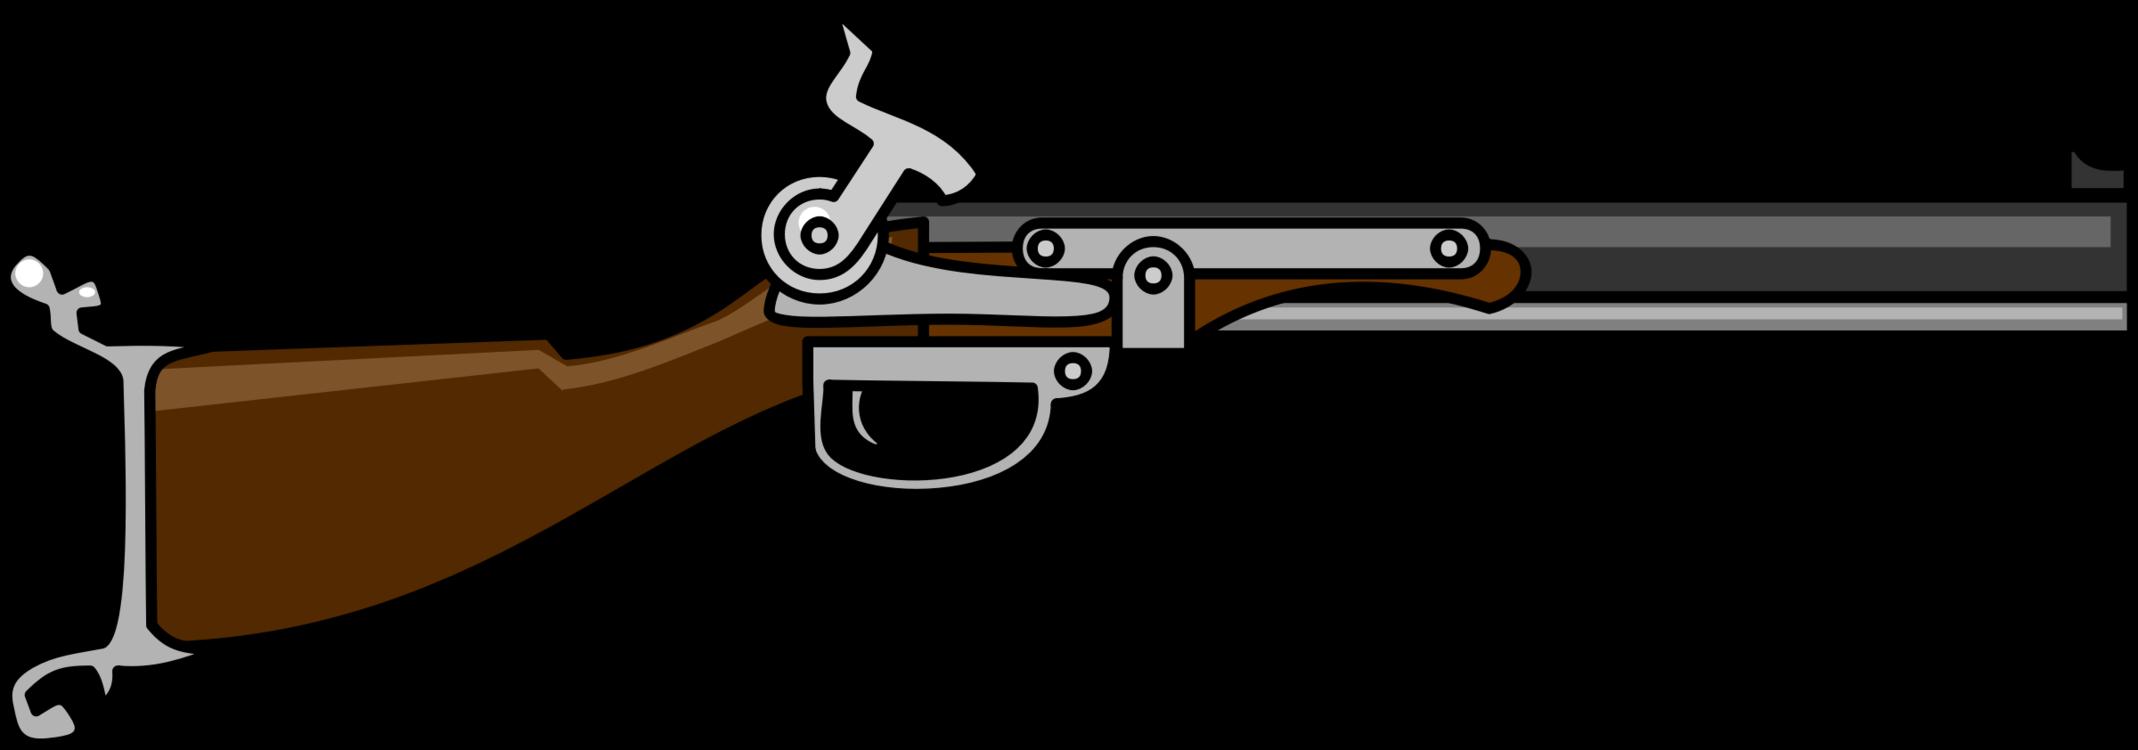 Barrel shotgun ranged weapon. Clipart gun pdf